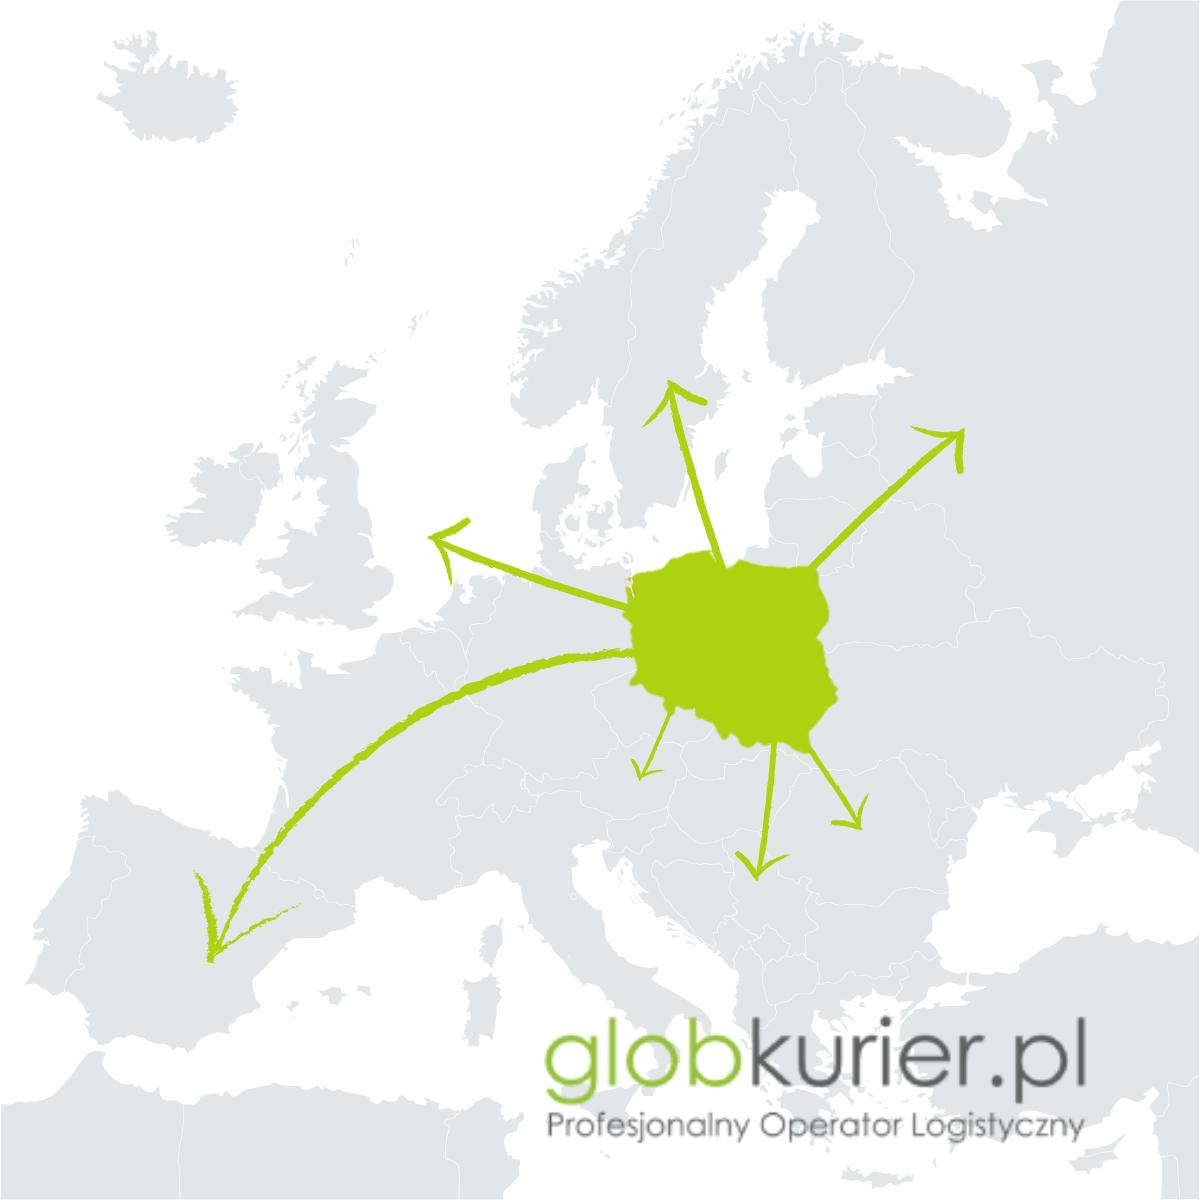 cross_border_globkurier